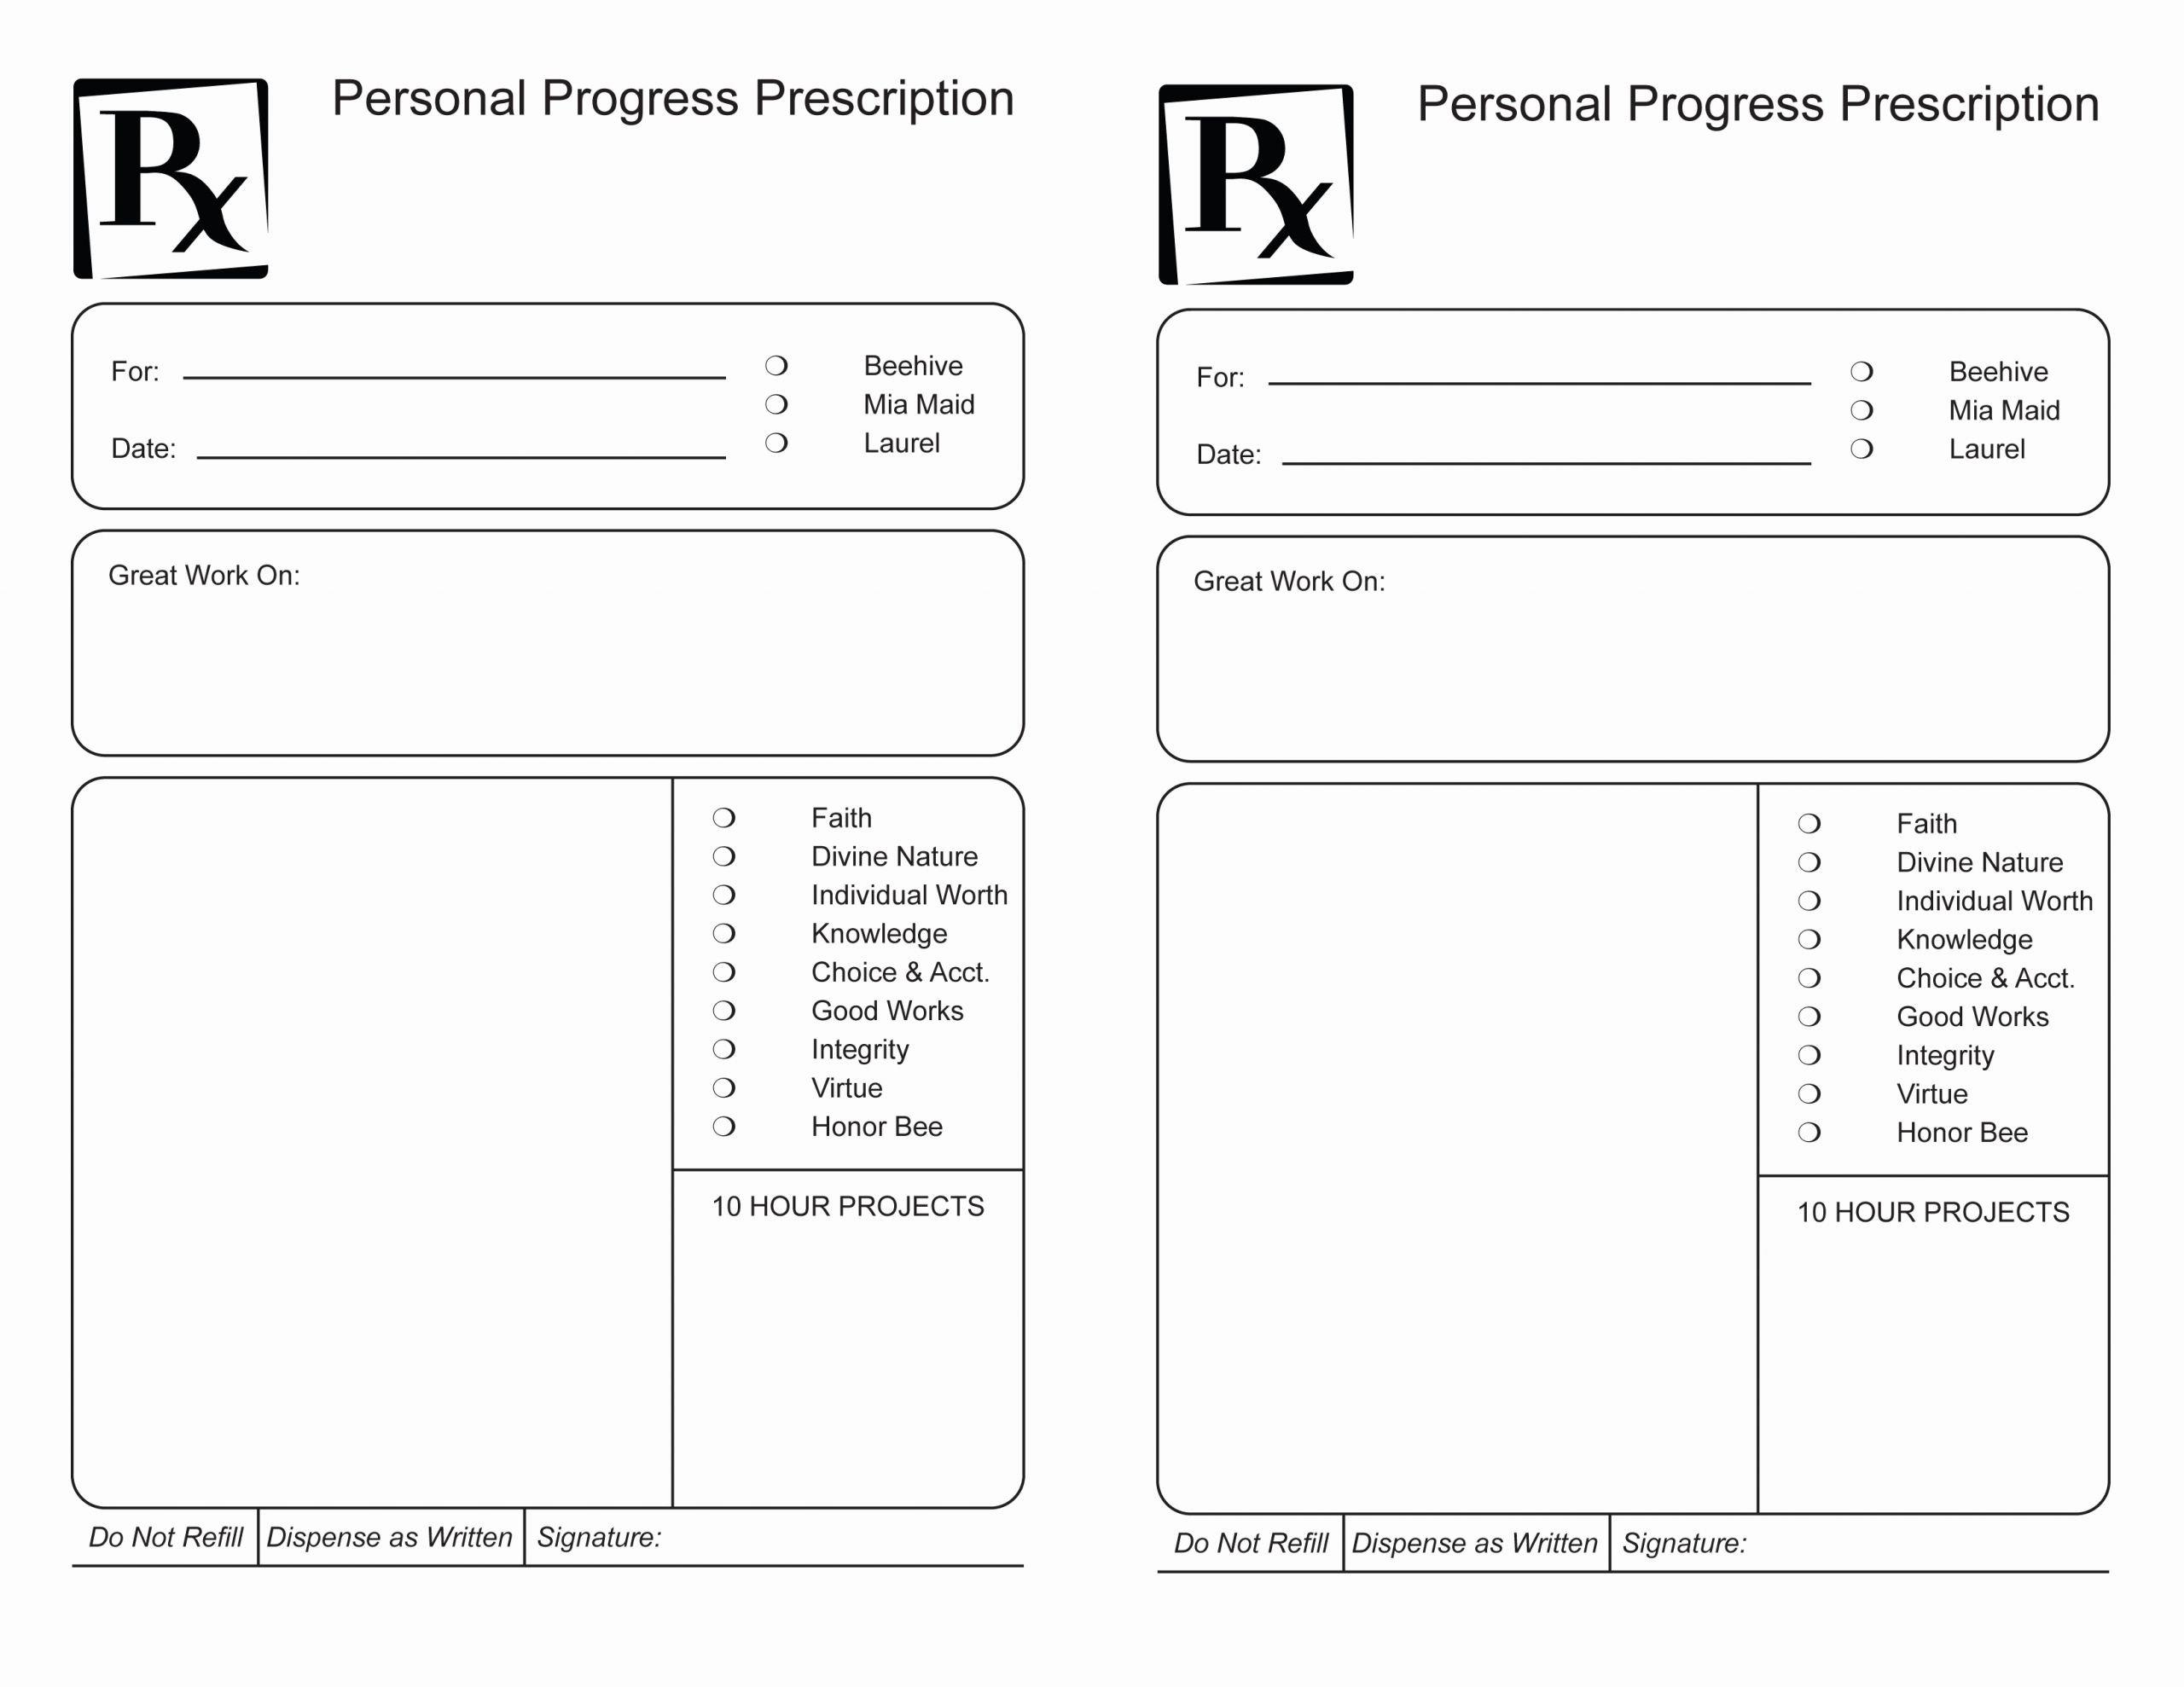 Prescription Pads Template Word Elegant Personal Progress Prescription Pad – the Gospel Home